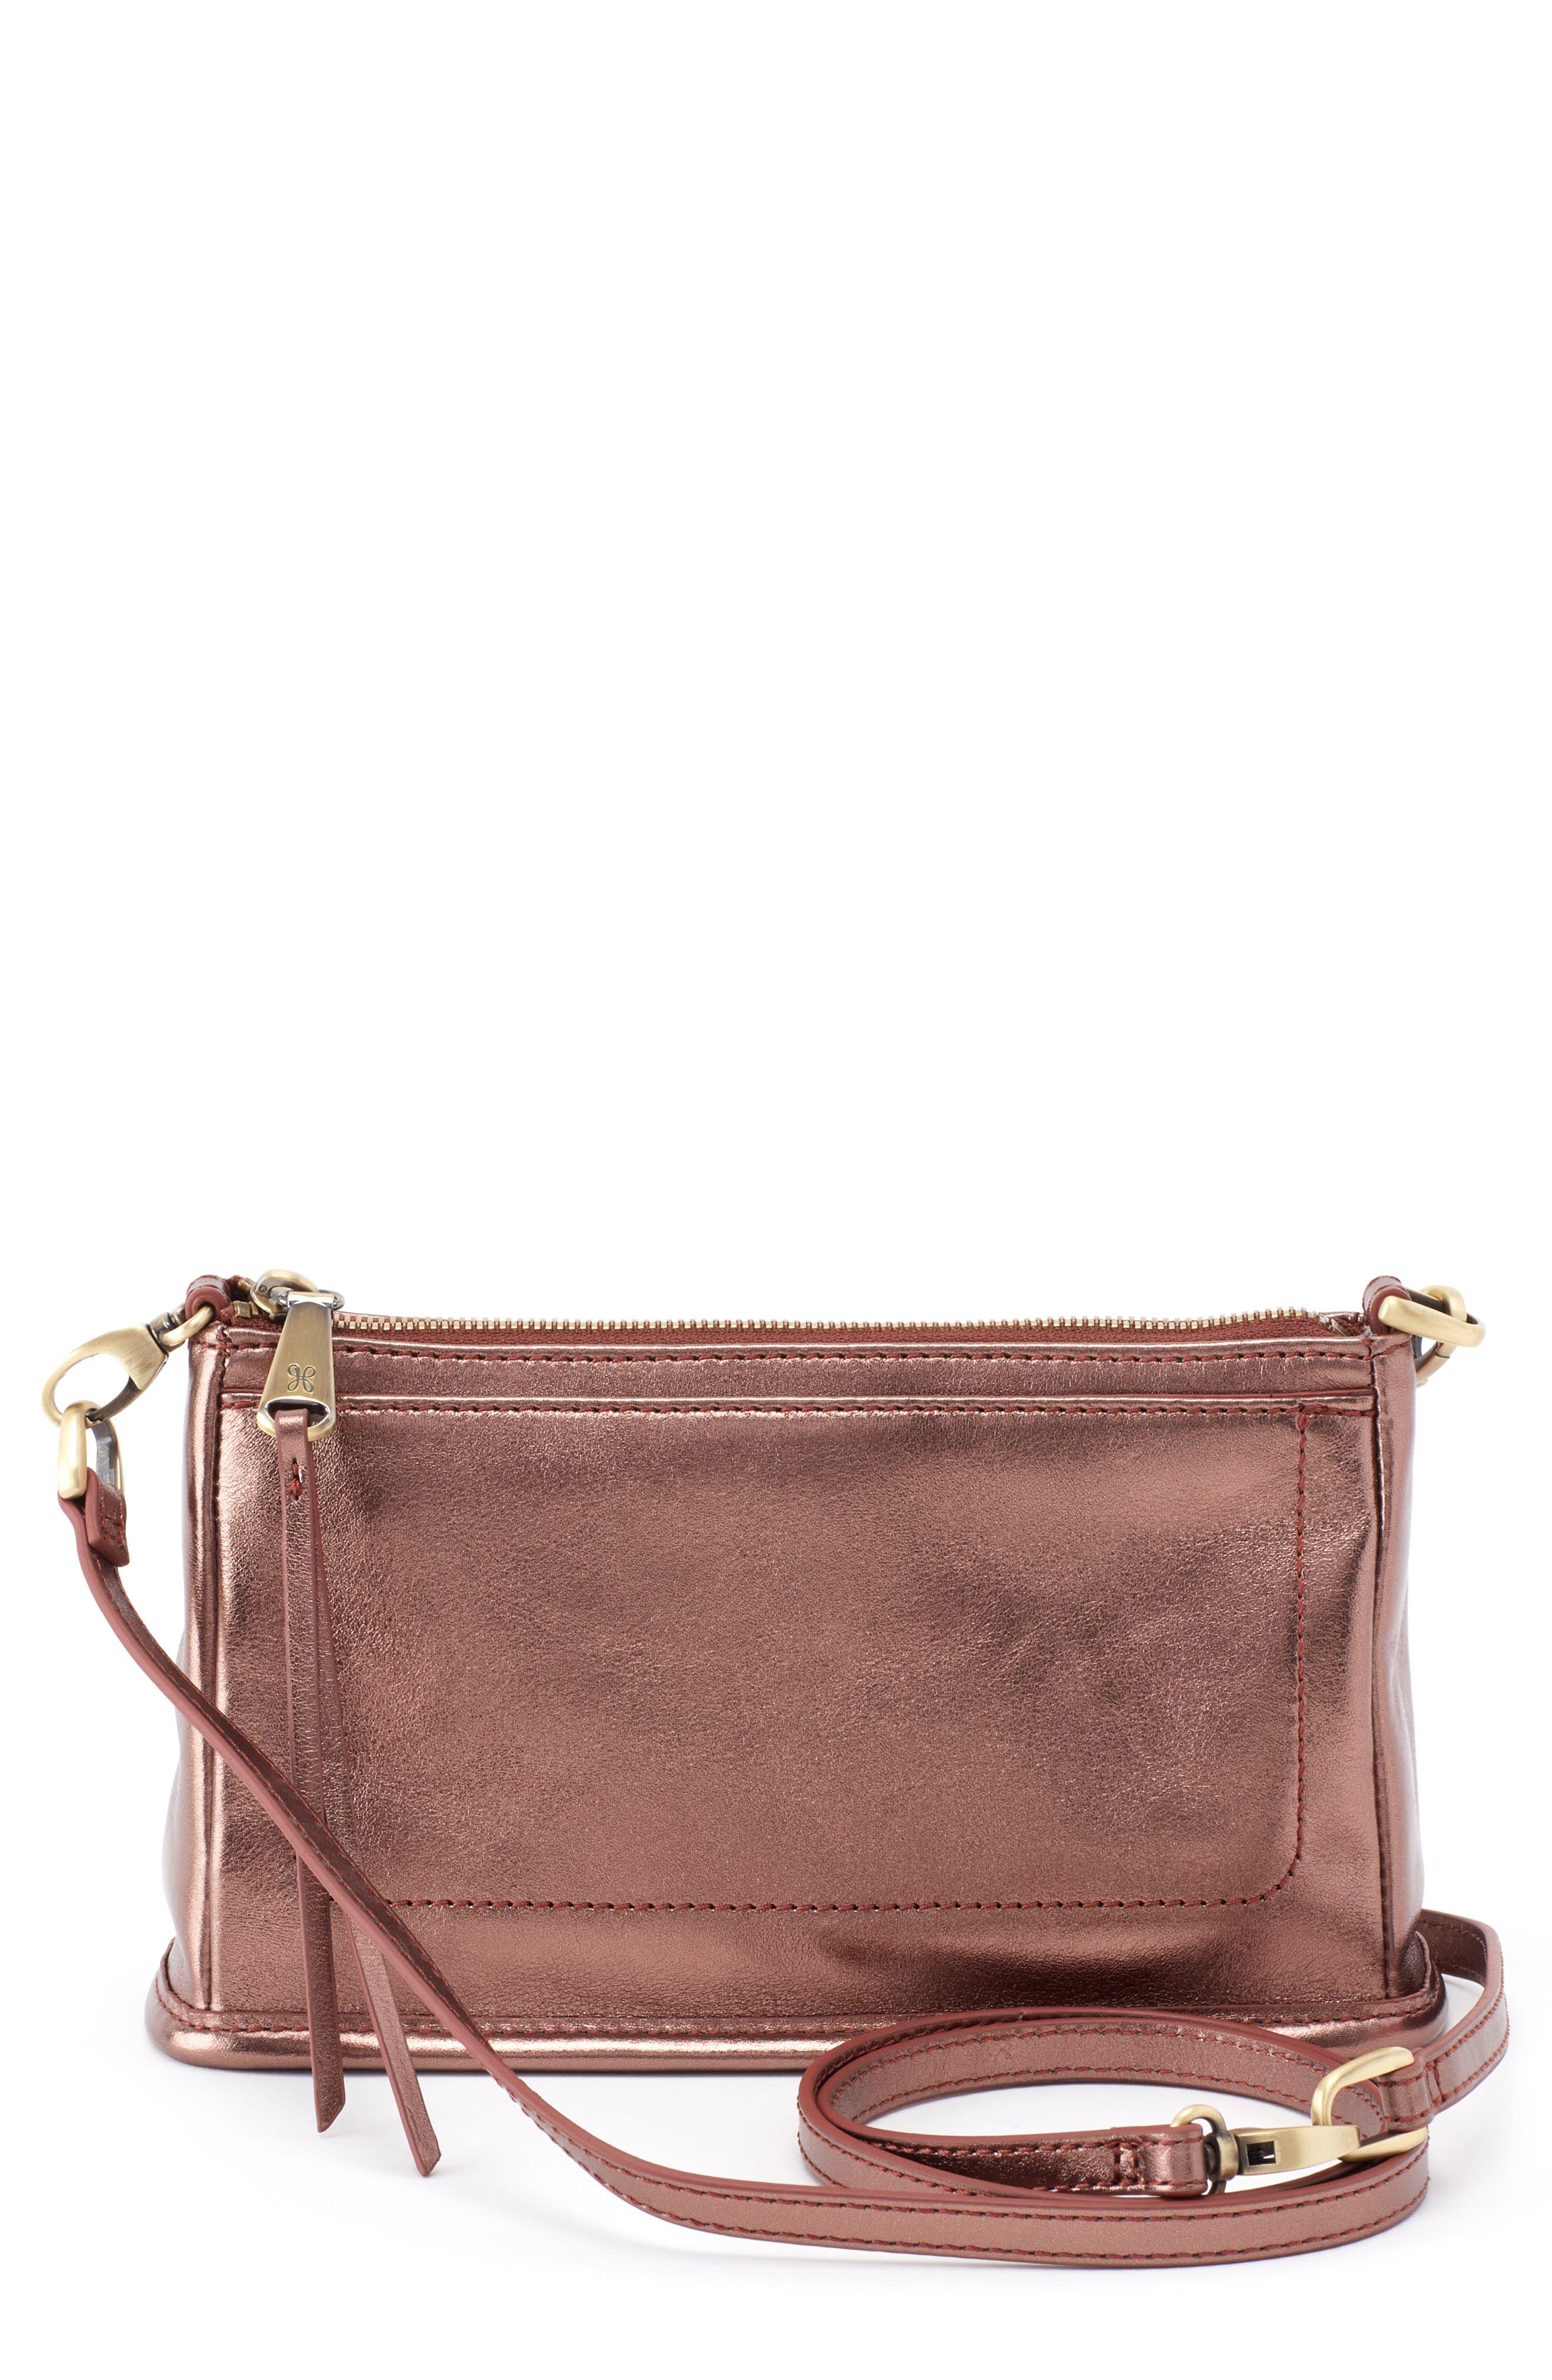 'Small Cadence' Leather Crossbody Bag,                             Main thumbnail 1, color,                             Burnt Bronze